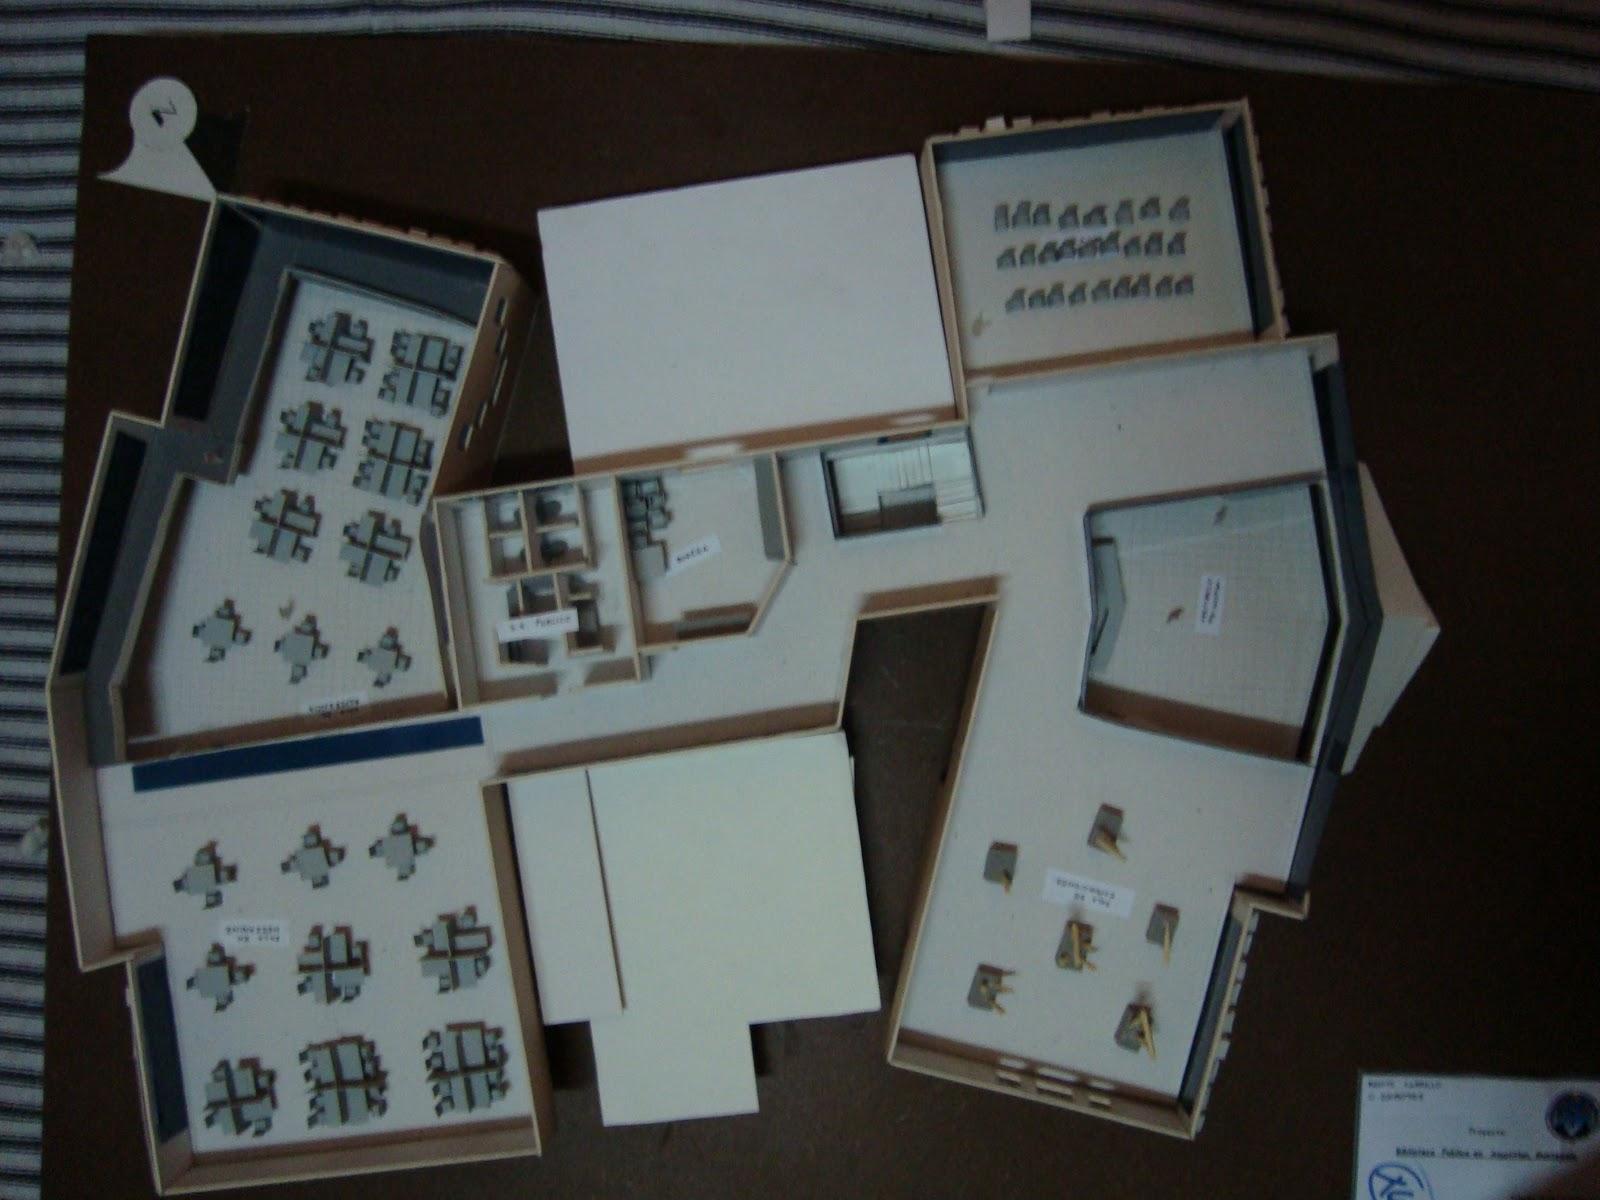 Portafolio virtual dise o arquitectonico ii for Planta arquitectonica biblioteca